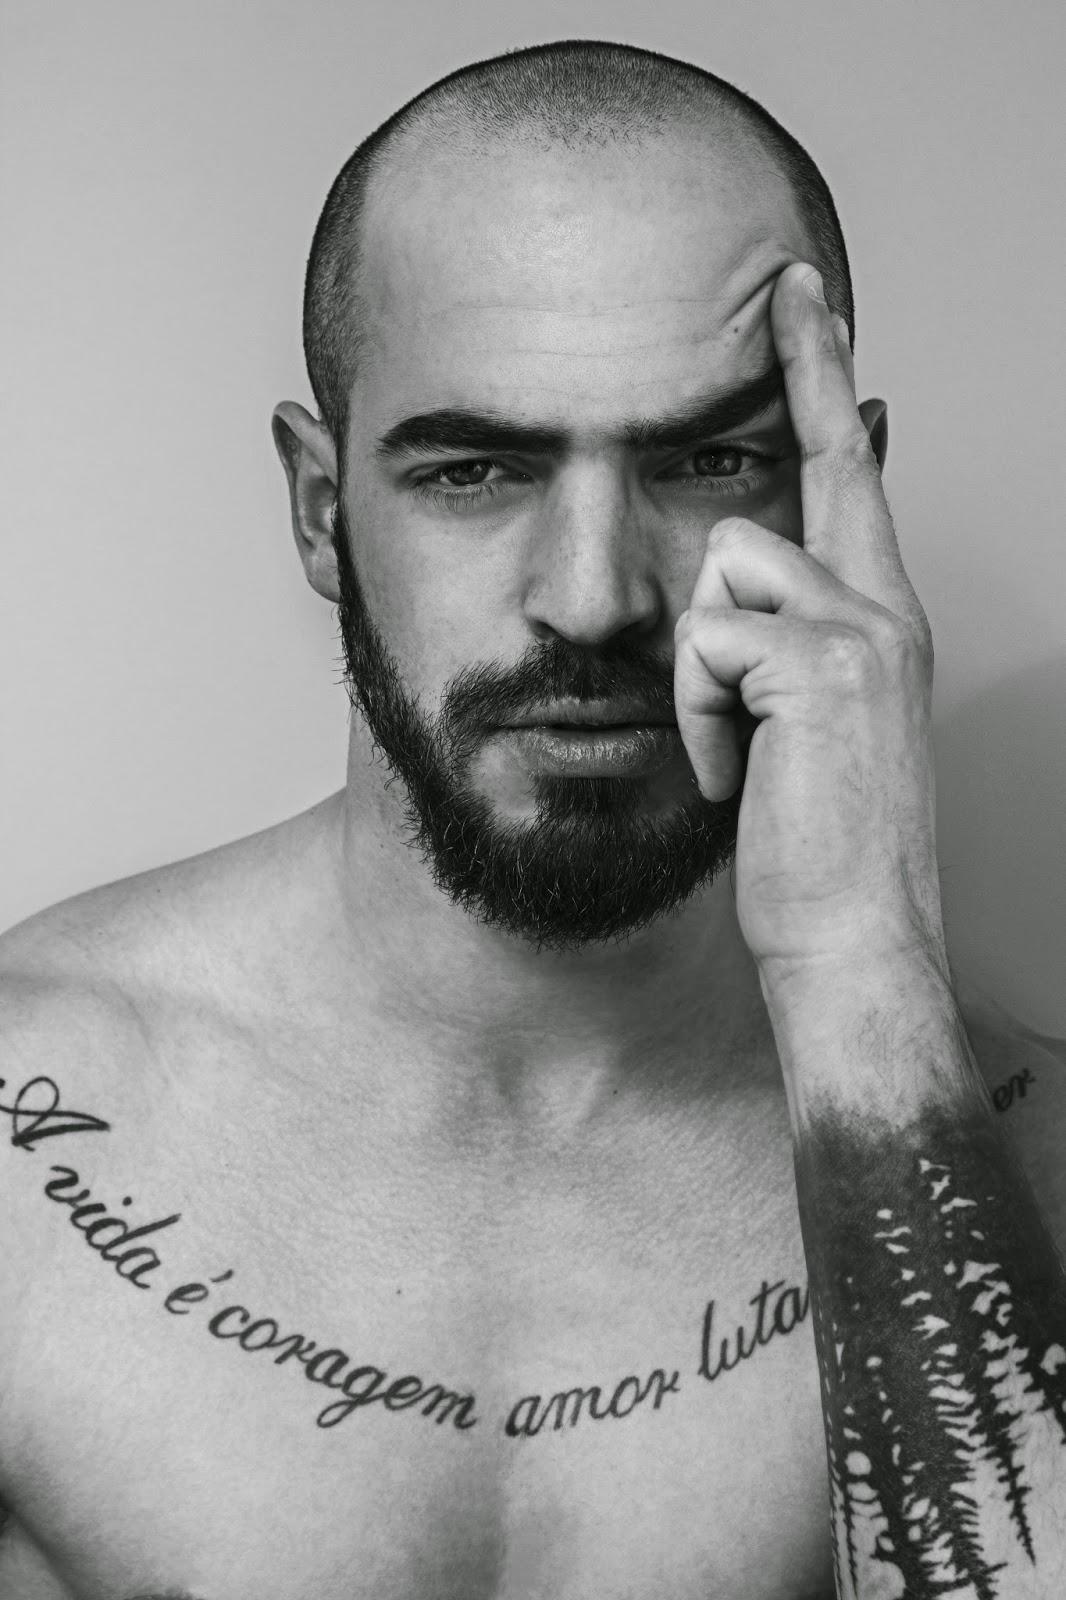 Fotografia, Fábio Caetano, Modelo, Joni Nuñez, Just Models, Trend me too, Marta F. Cardoso, Test Shoot